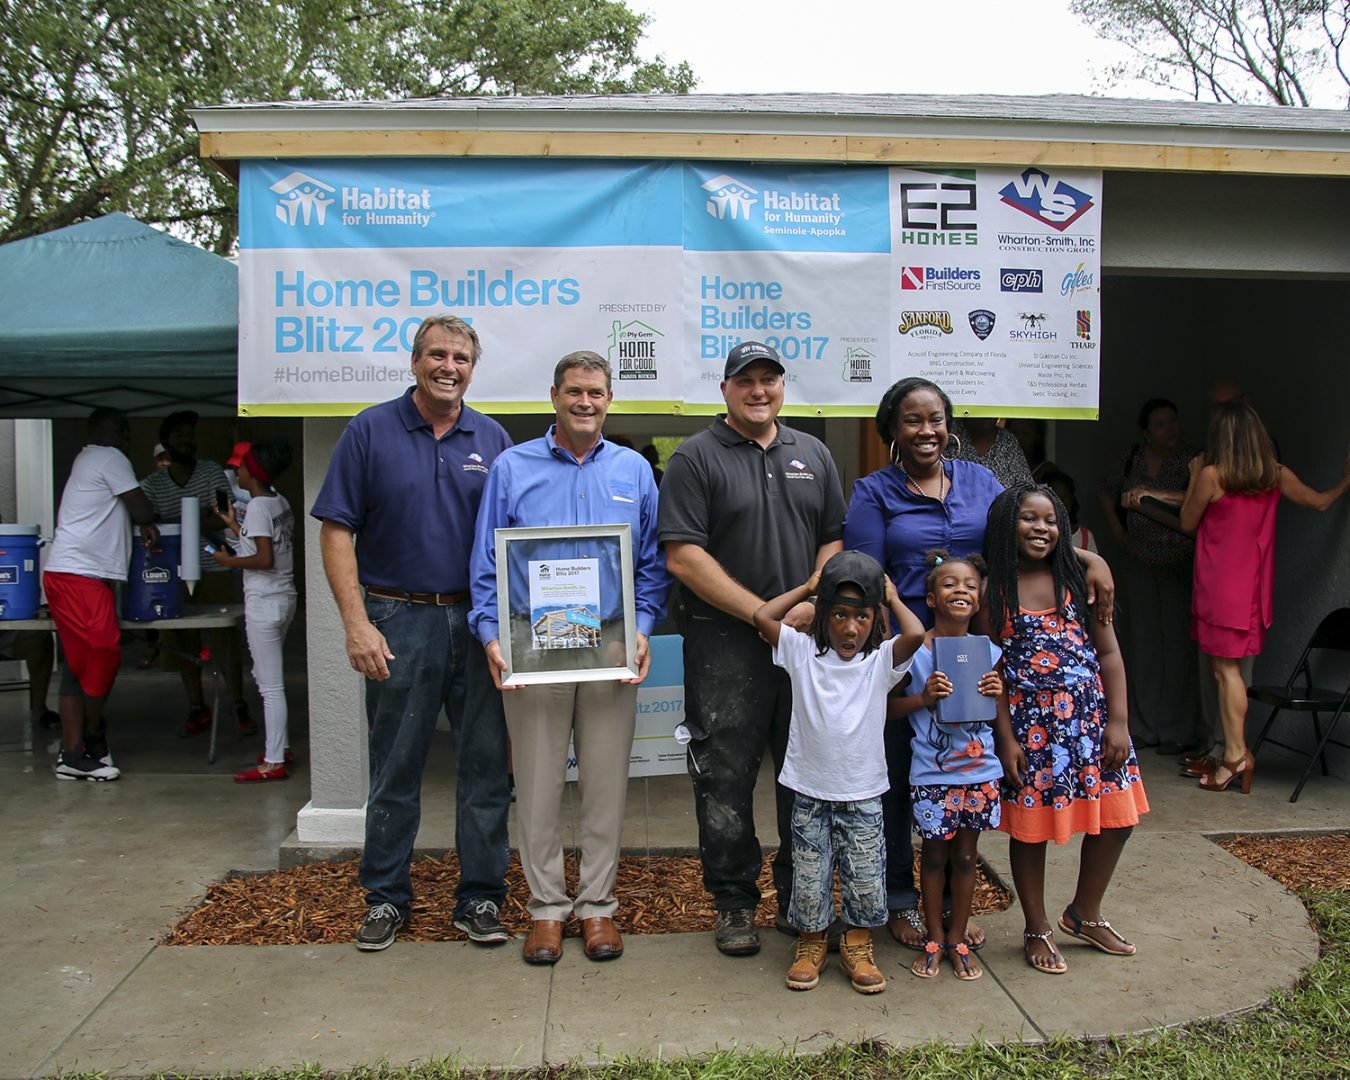 Wharton-Smith Participates in Habitat for Humanity Home Builders Blitz